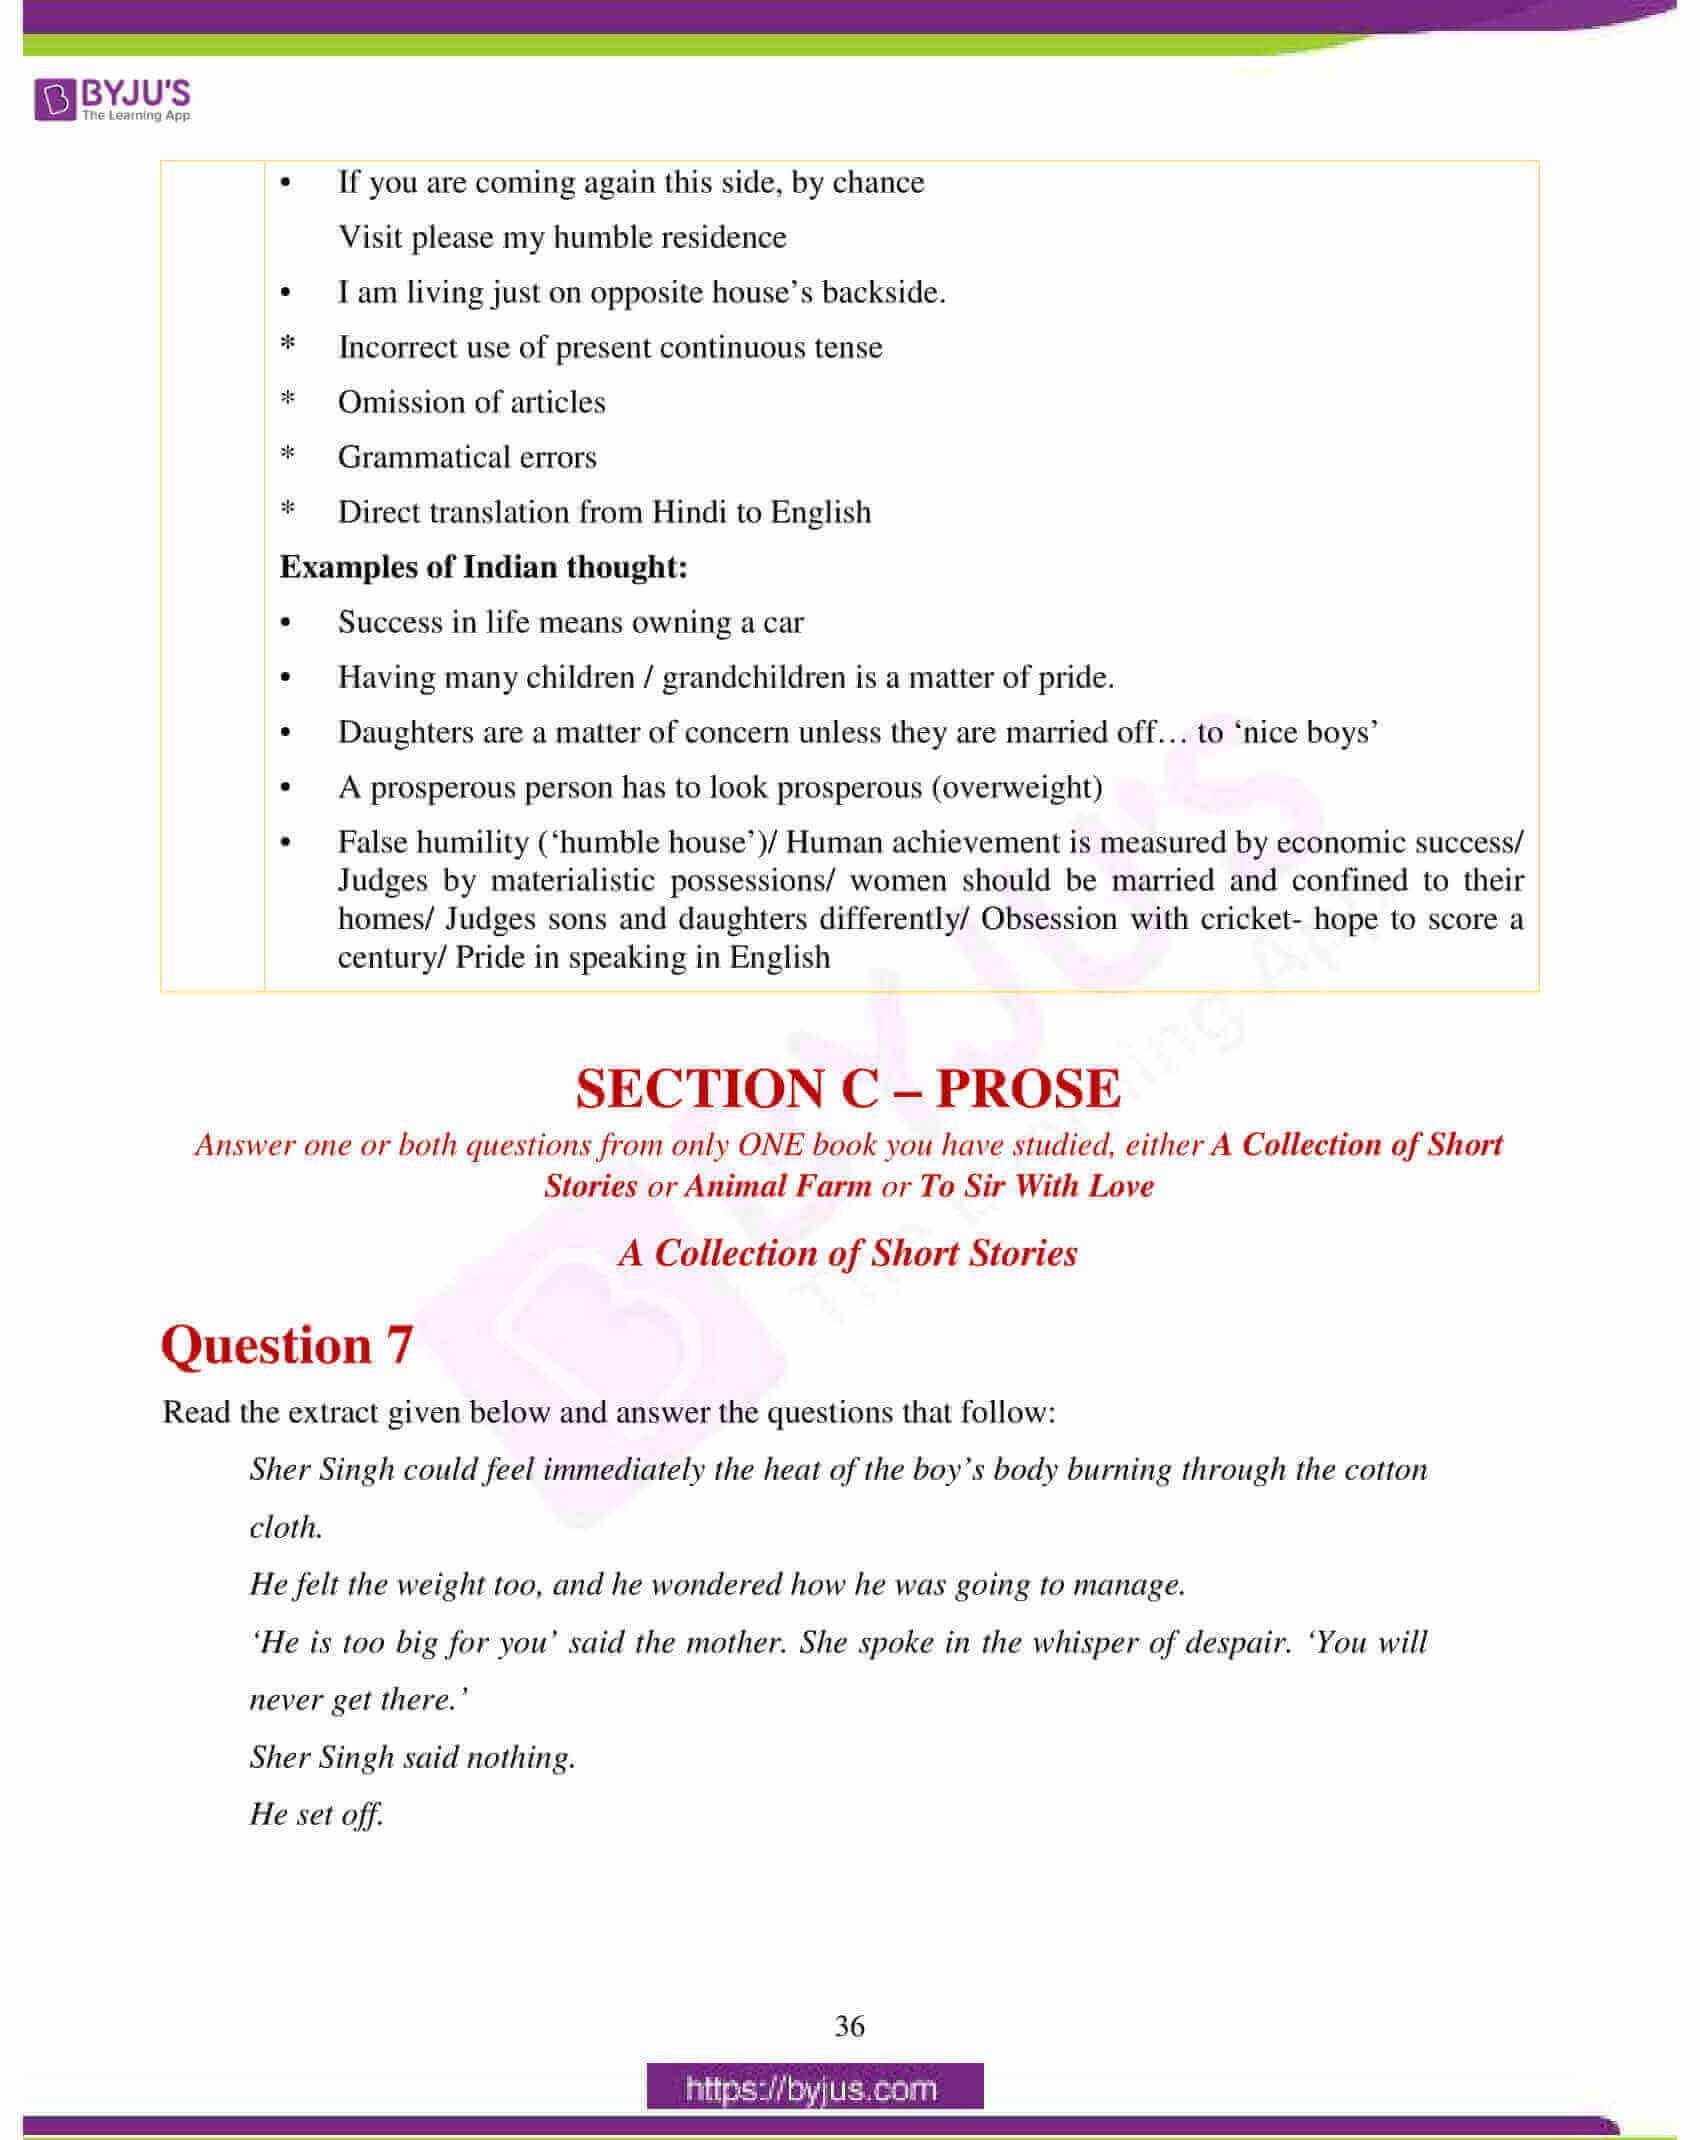 icse class 10 english lit question paper solution 2018 12